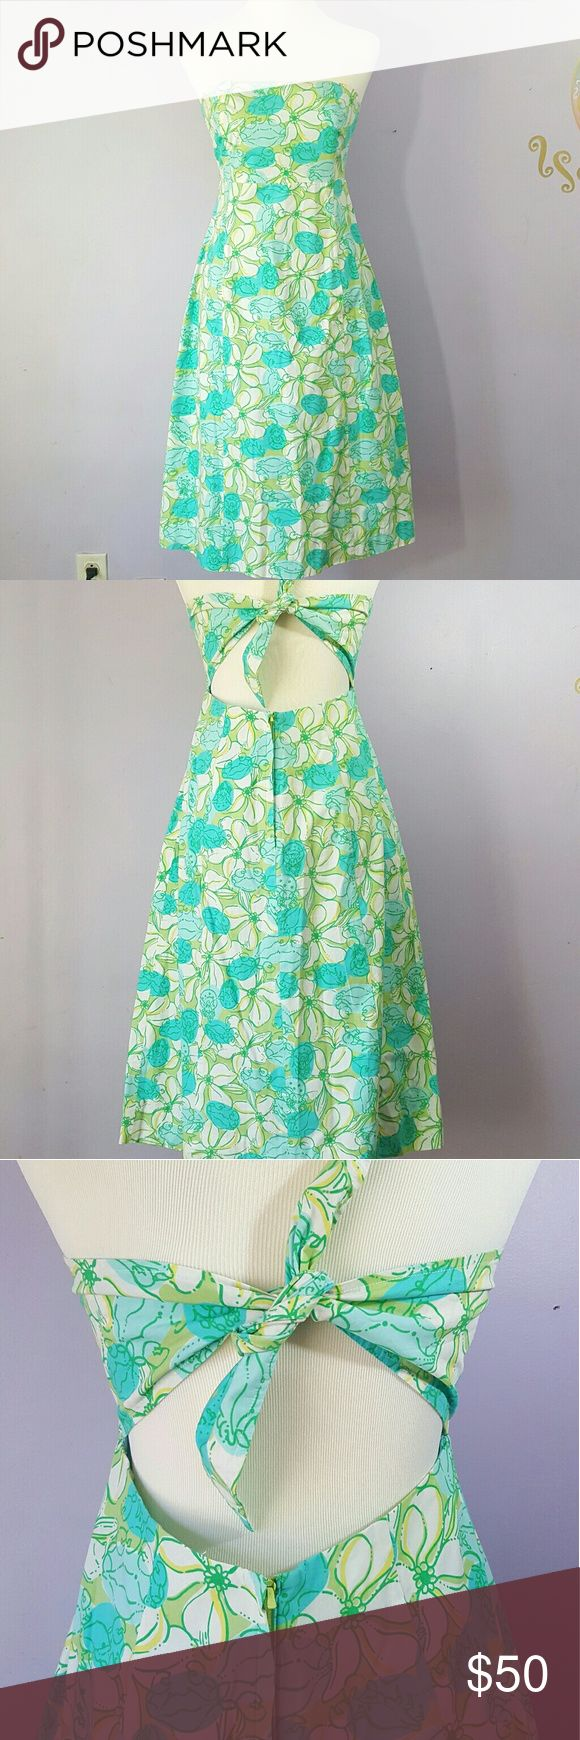 Selling this Lilly Pulitzer Guava Green Crab Cake Dress on Poshmark! My username is: rositariv. #shopmycloset #poshmark #fashion #shopping #style #forsale #Lilly Pulitzer #Dresses & Skirts